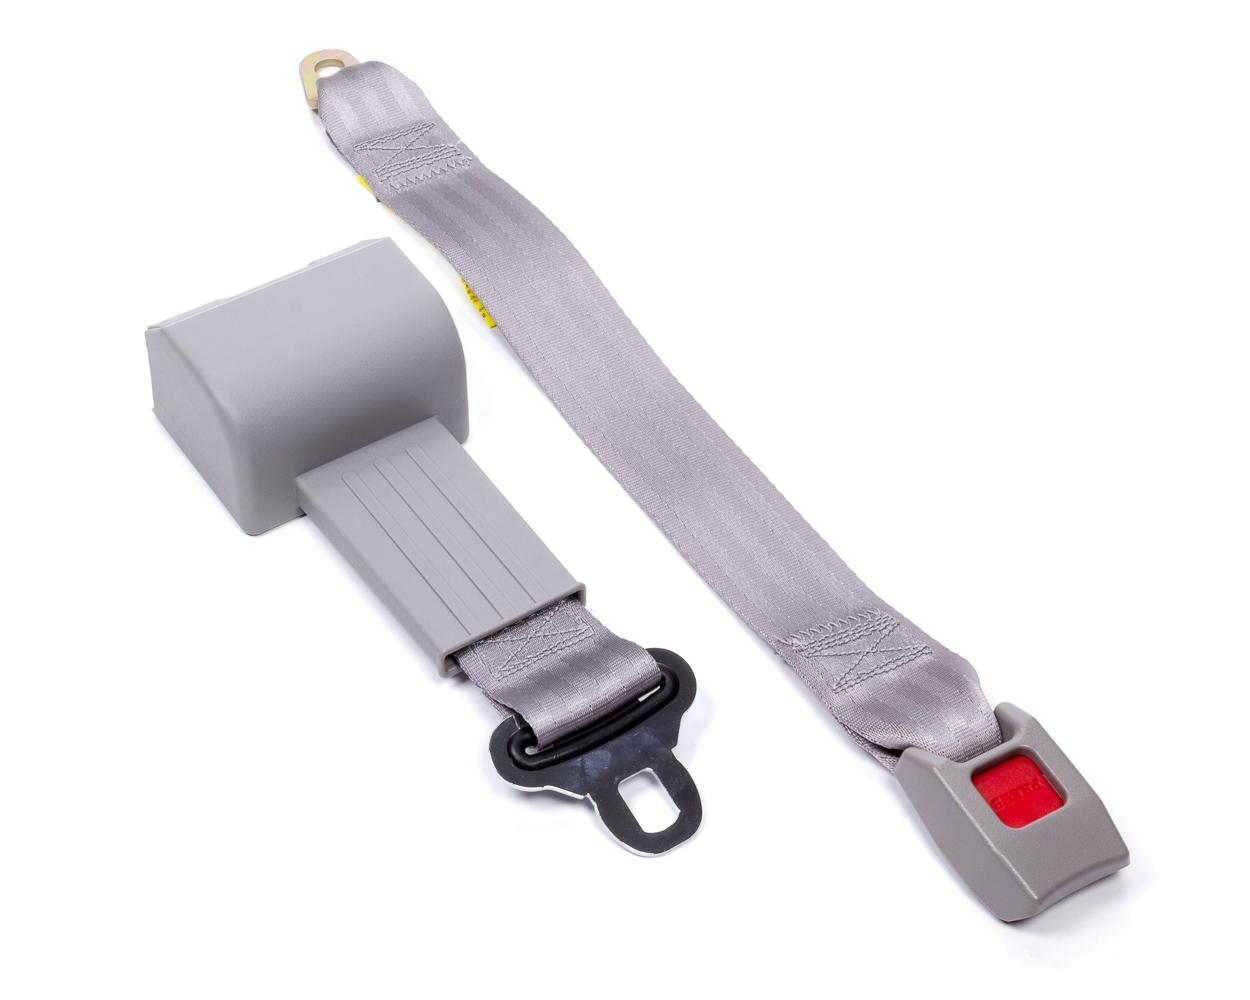 Beams Seatbelts 80695073-00-AA Seat Belt, Lap, Bench Seat Style, Retractable, Bolt-On, Floor Mount, Nylon, Gray, Each